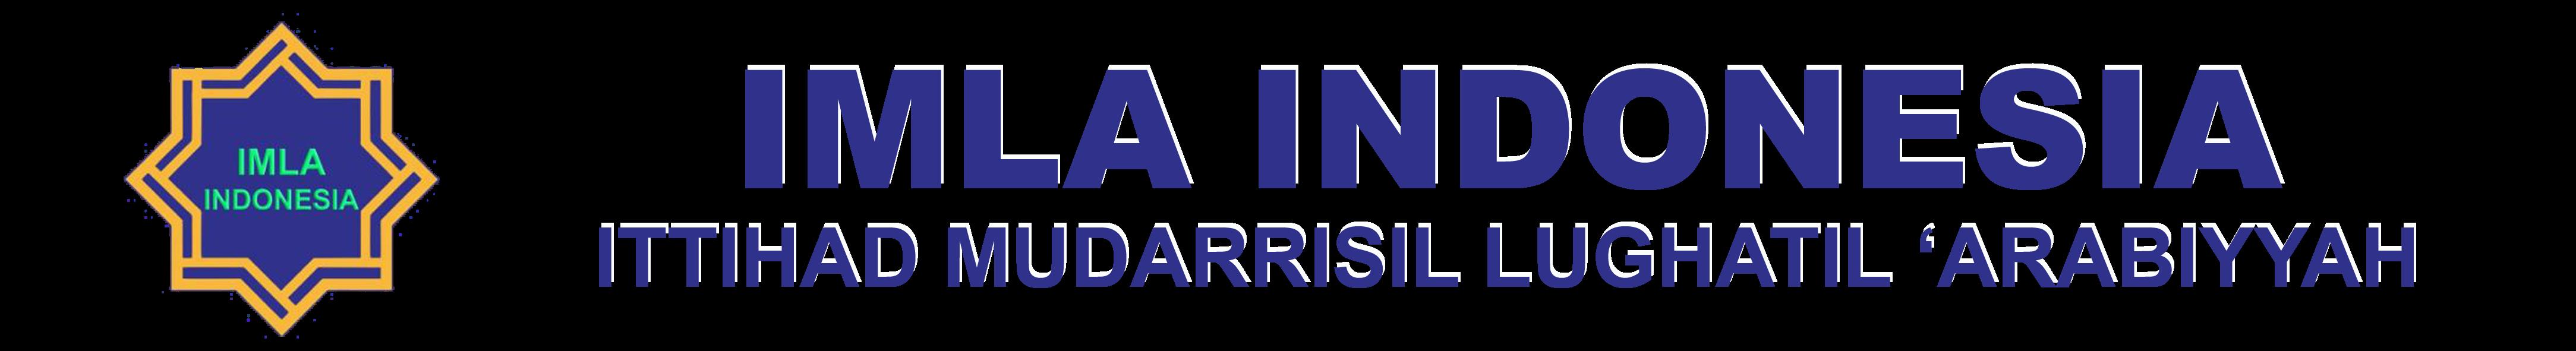 IMLA (Ittihad Mudarrisil Lughatil 'Arabiyyah) Indonesia